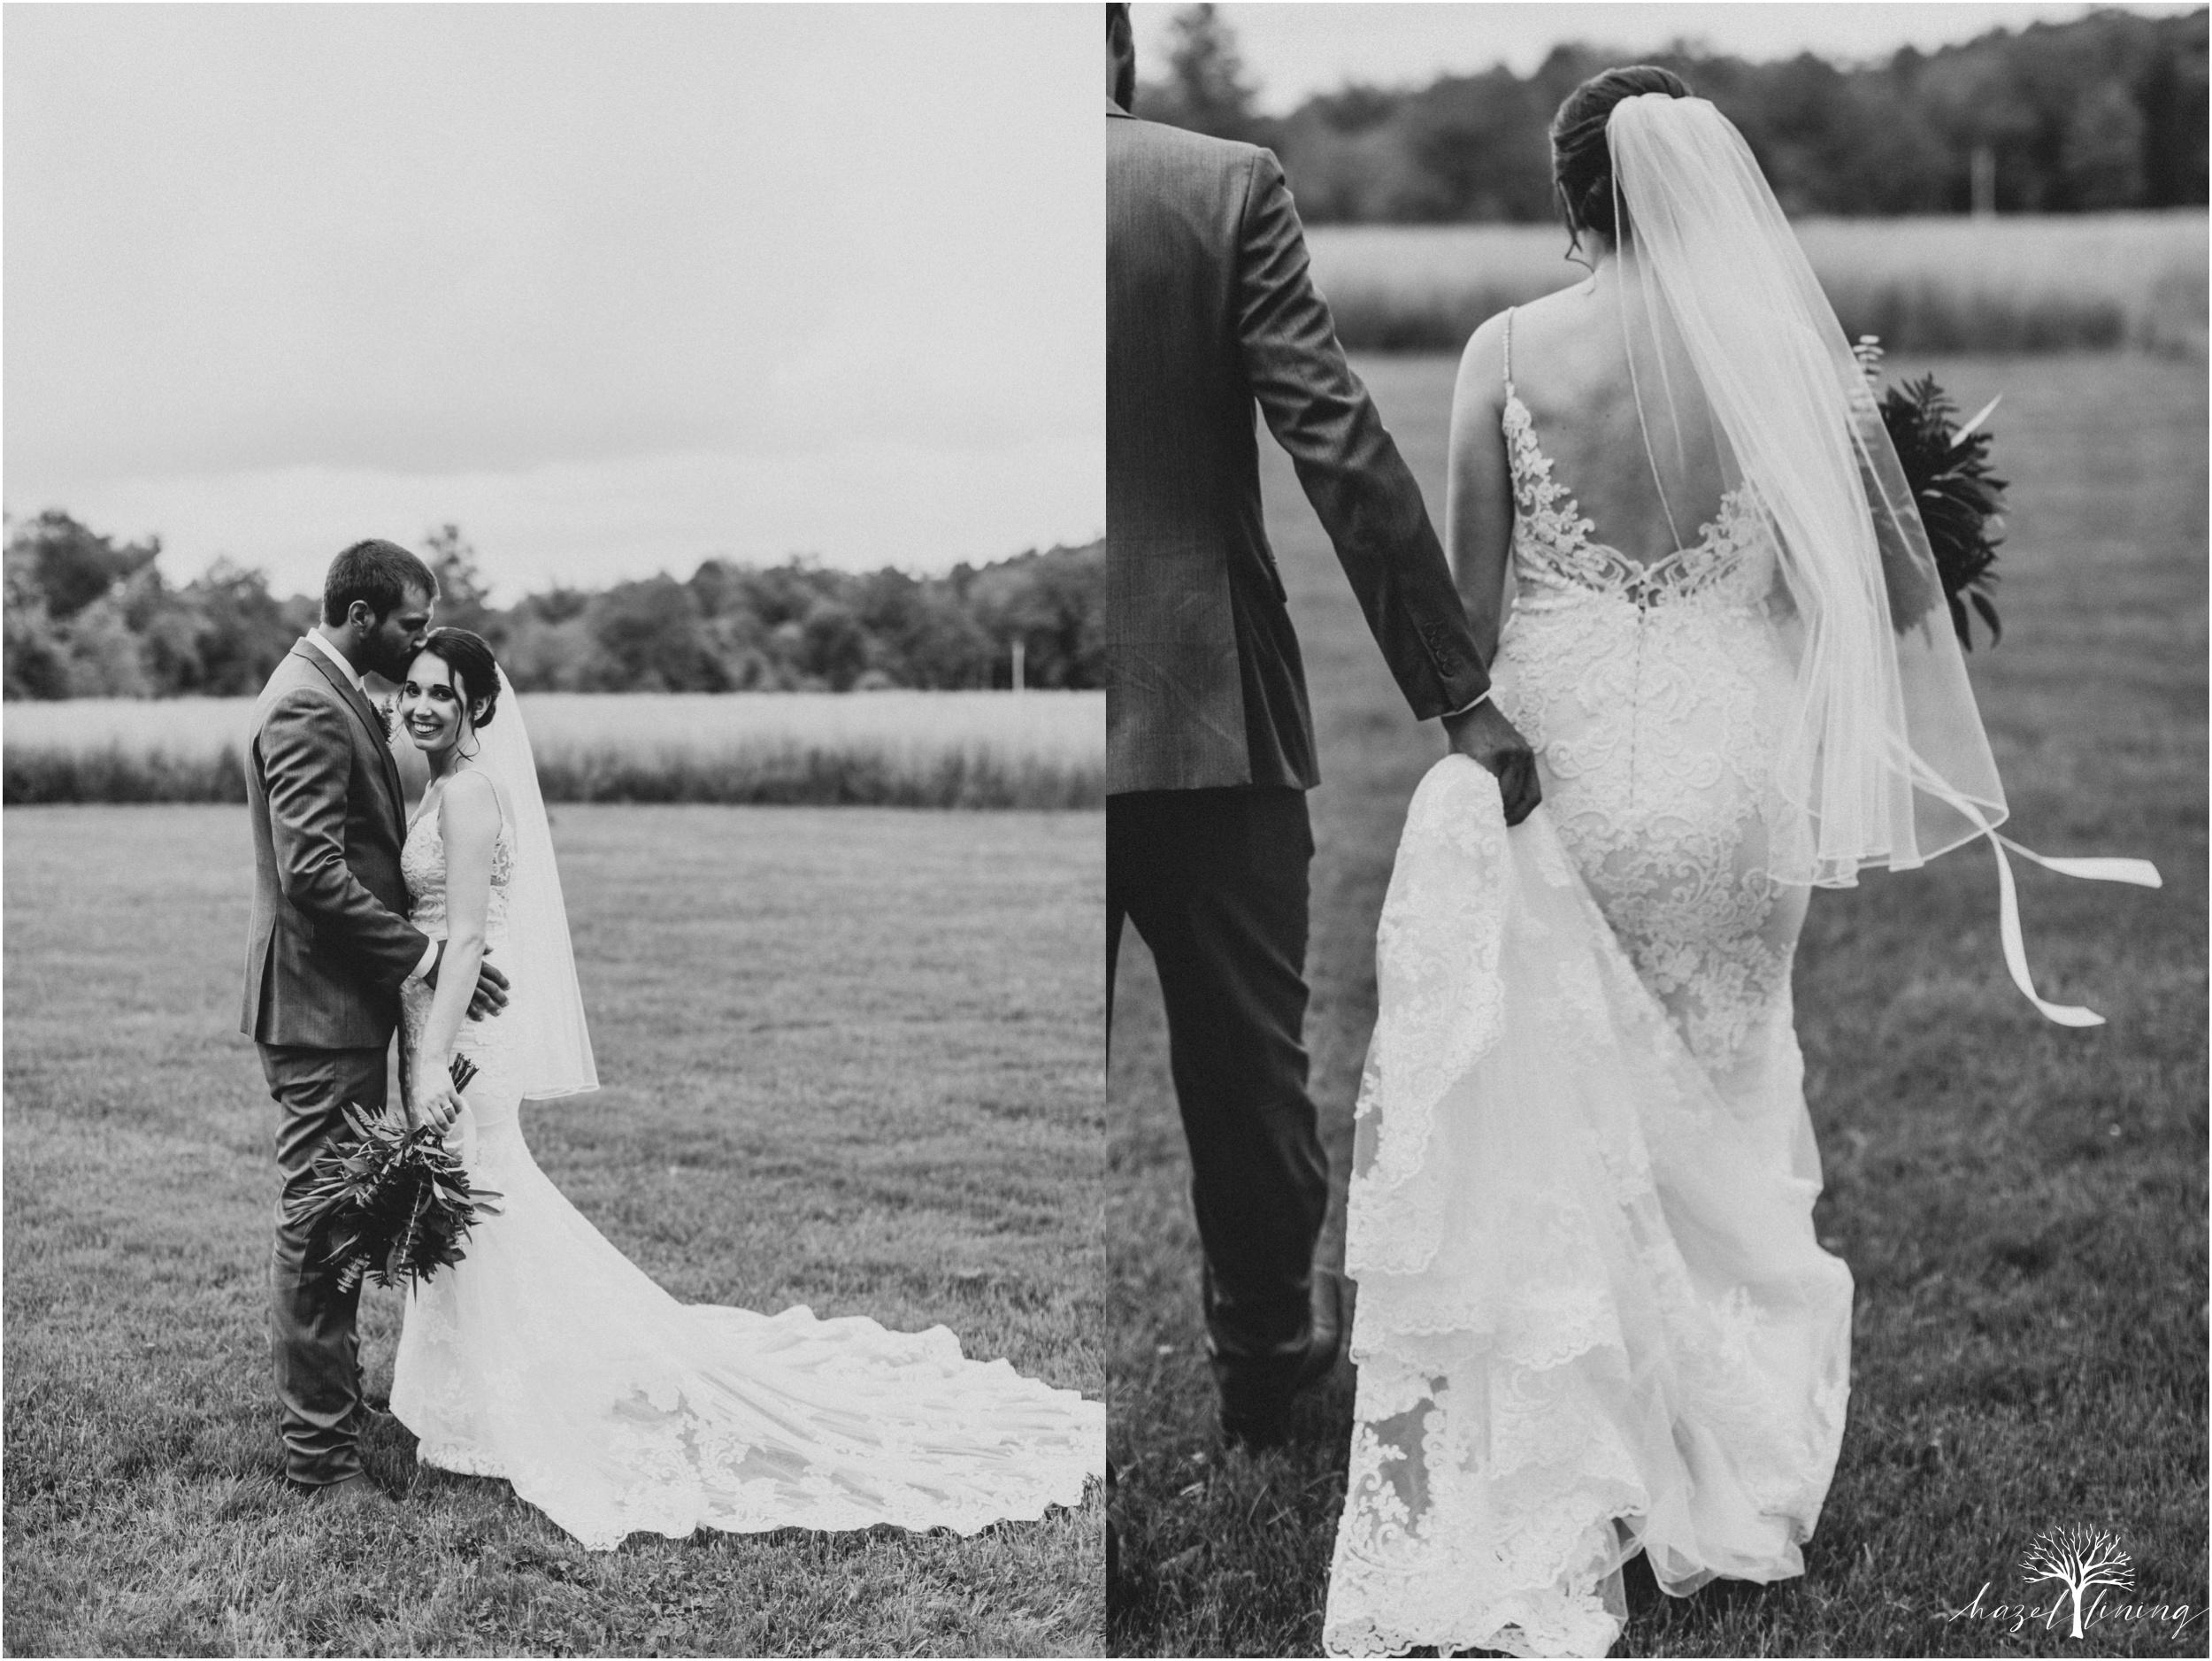 hazel-lining-travel-wedding-elopement-photography-lisa-landon-shoemaker-the-farm-bakery-and-events-bucks-county-quakertown-pennsylvania-summer-country-outdoor-farm-wedding_0081.jpg